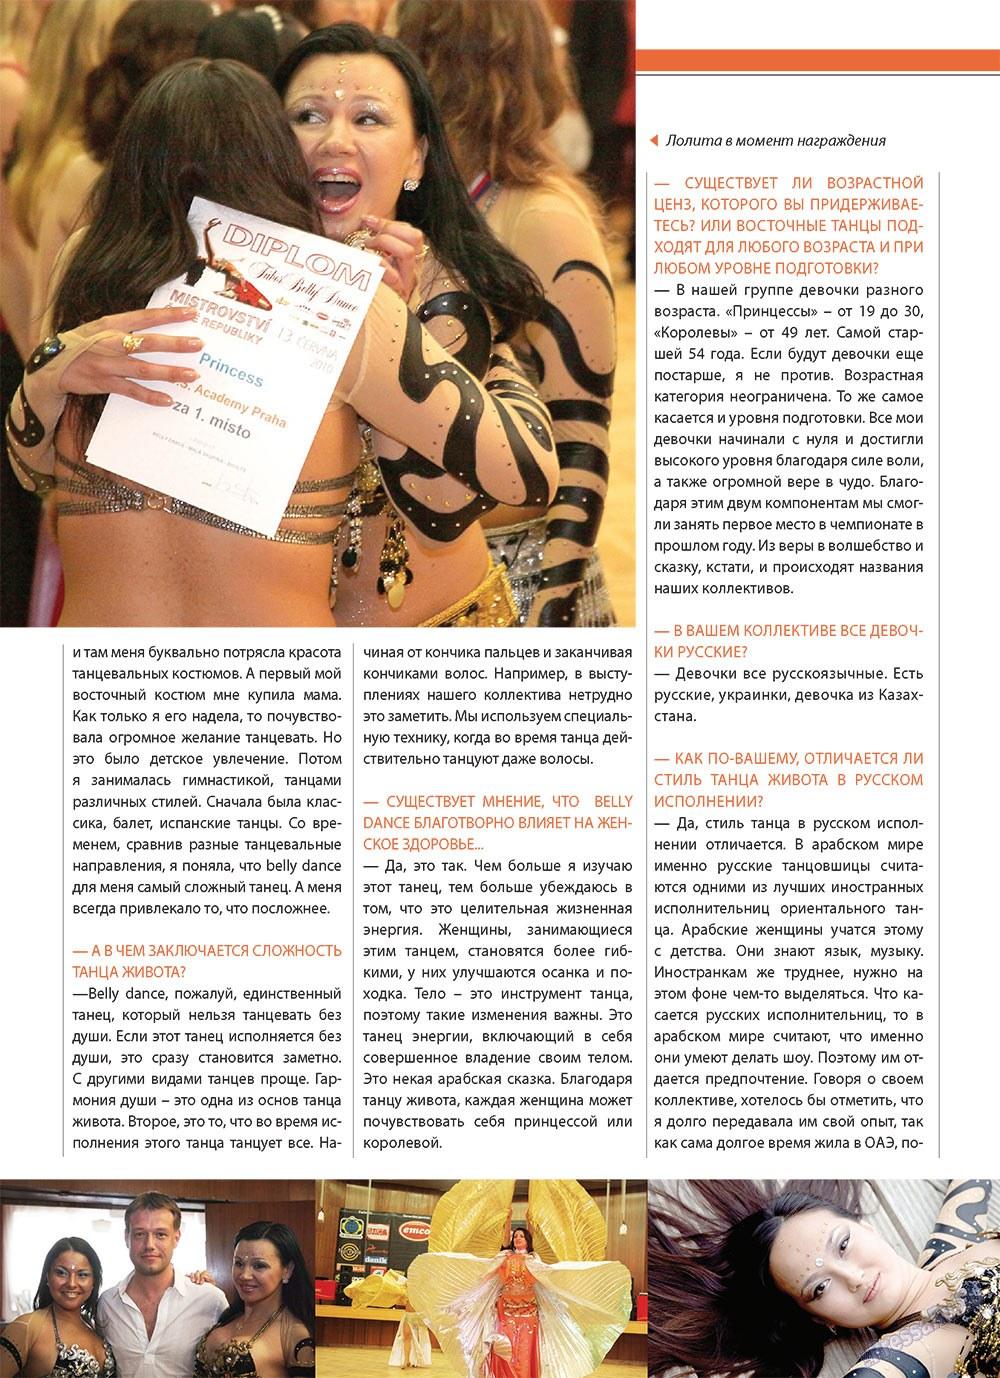 Артек (журнал). 2010 год, номер 4, стр. 24